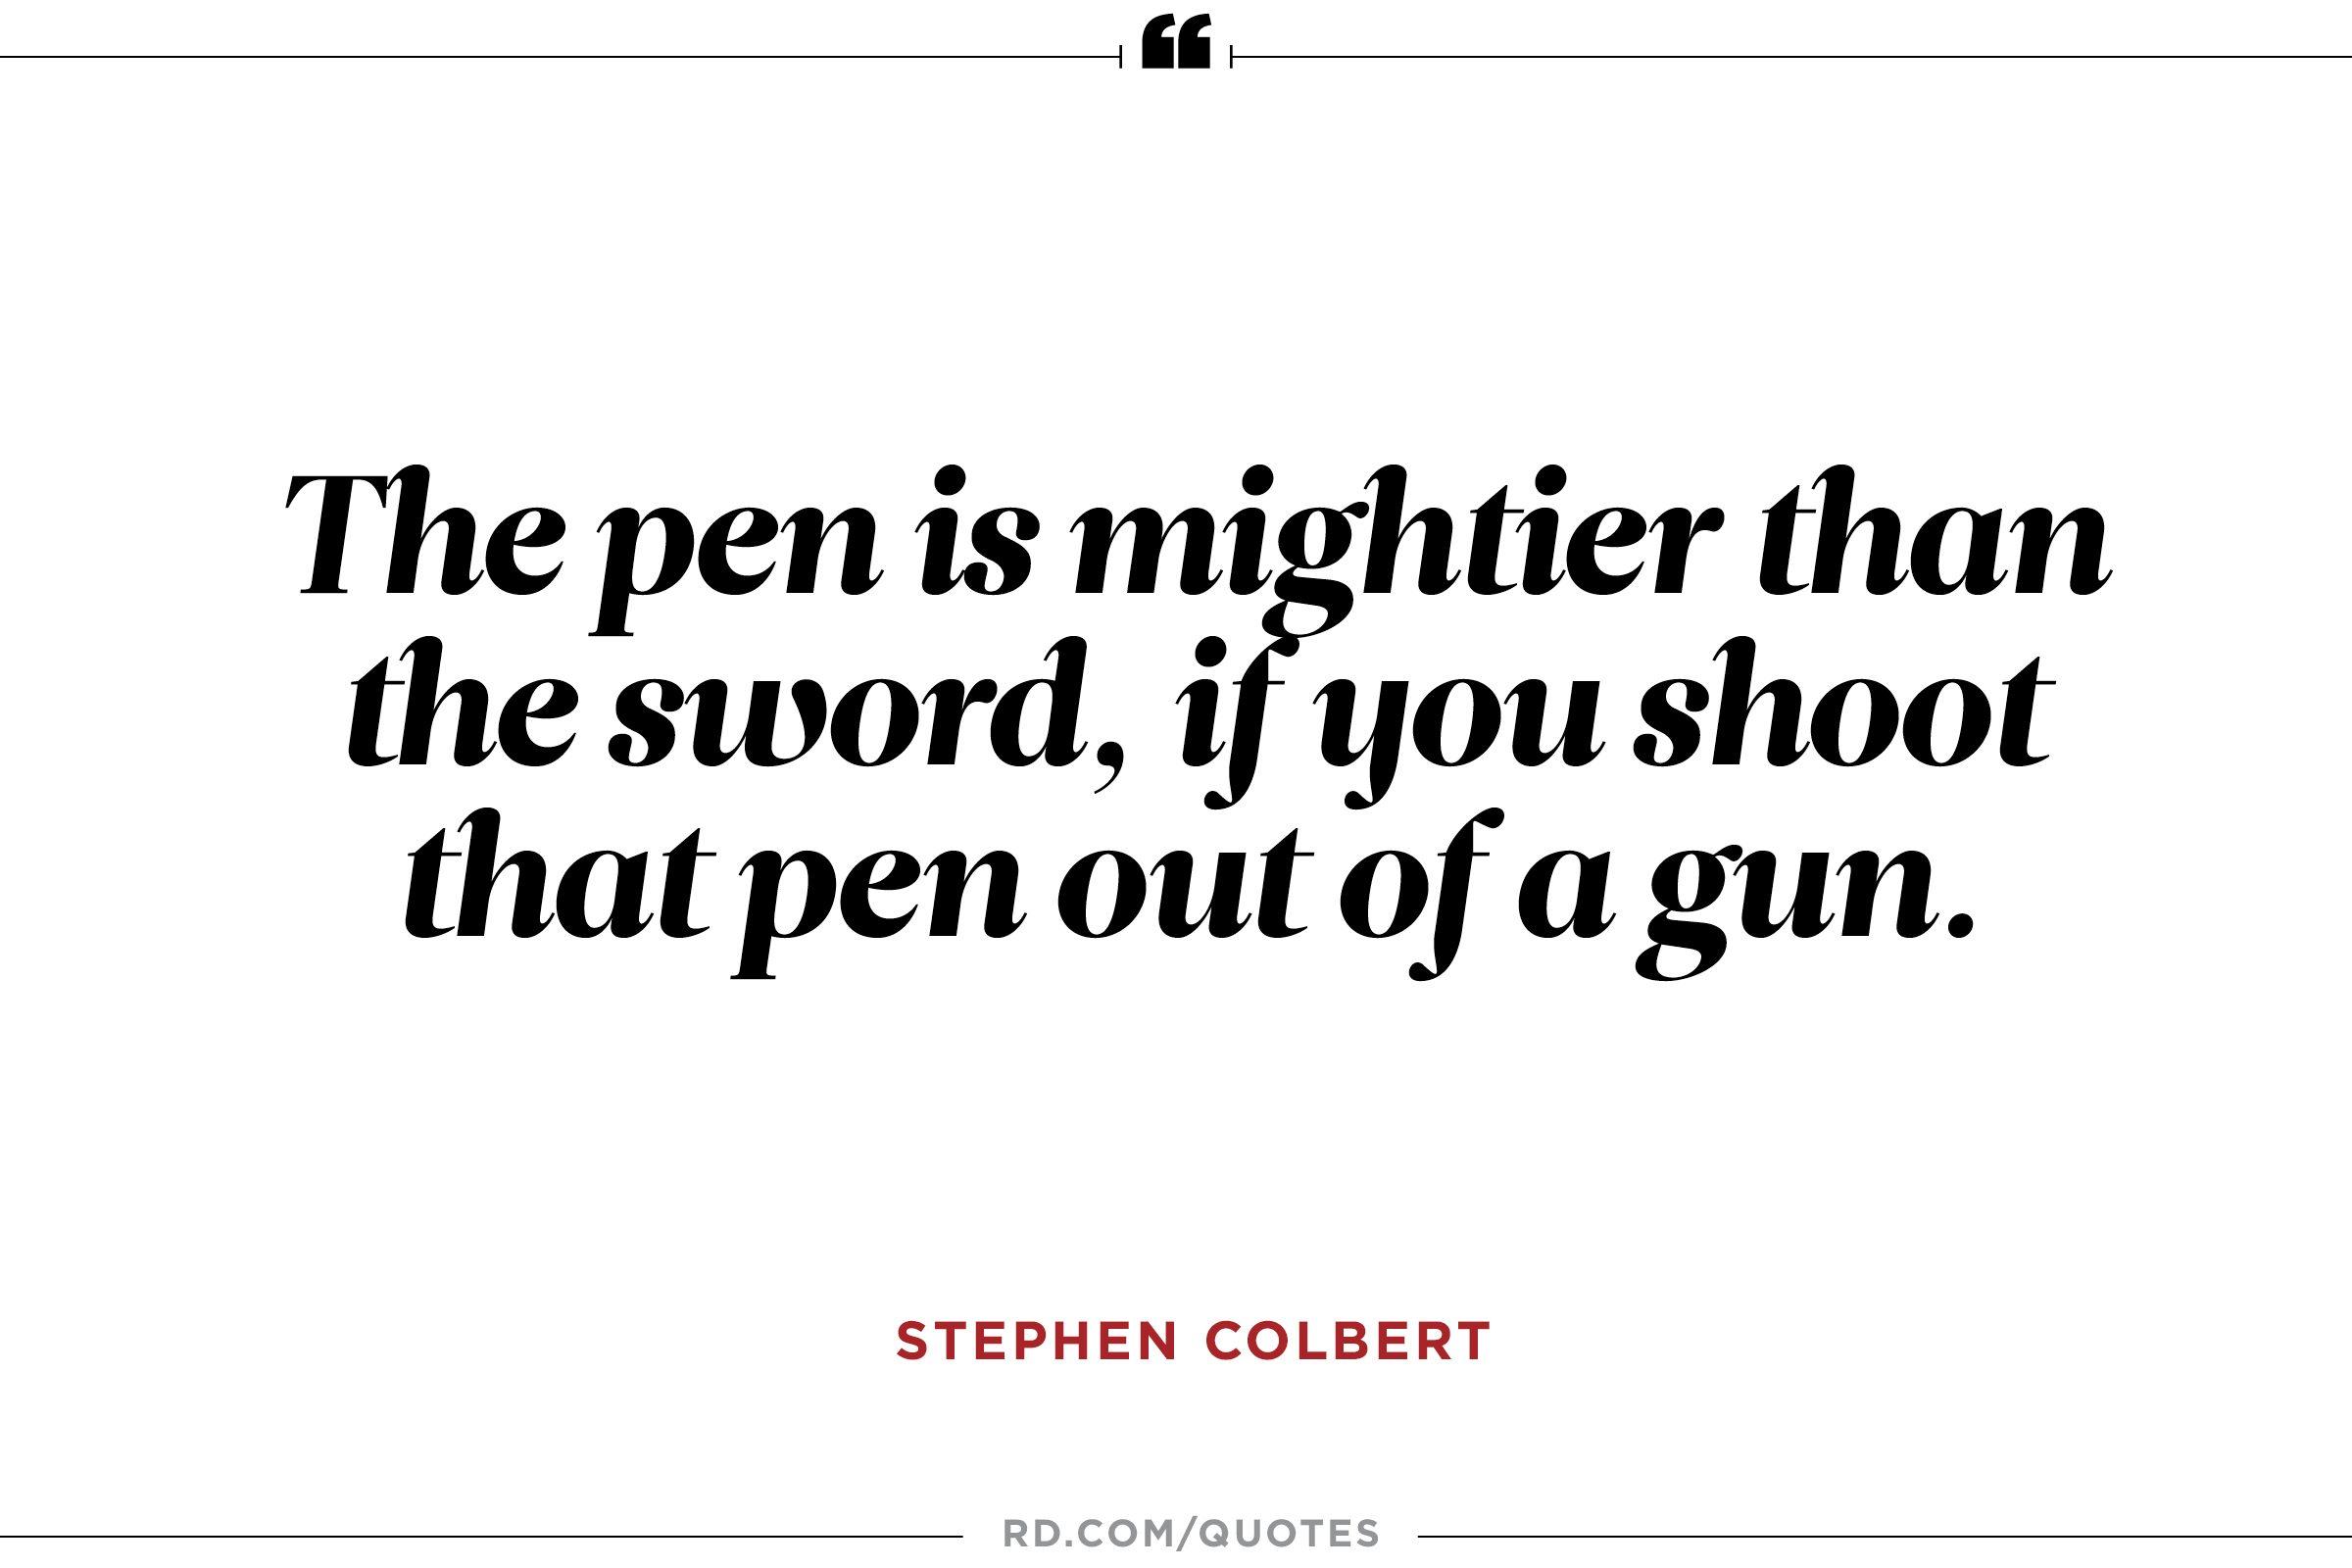 The pen is...